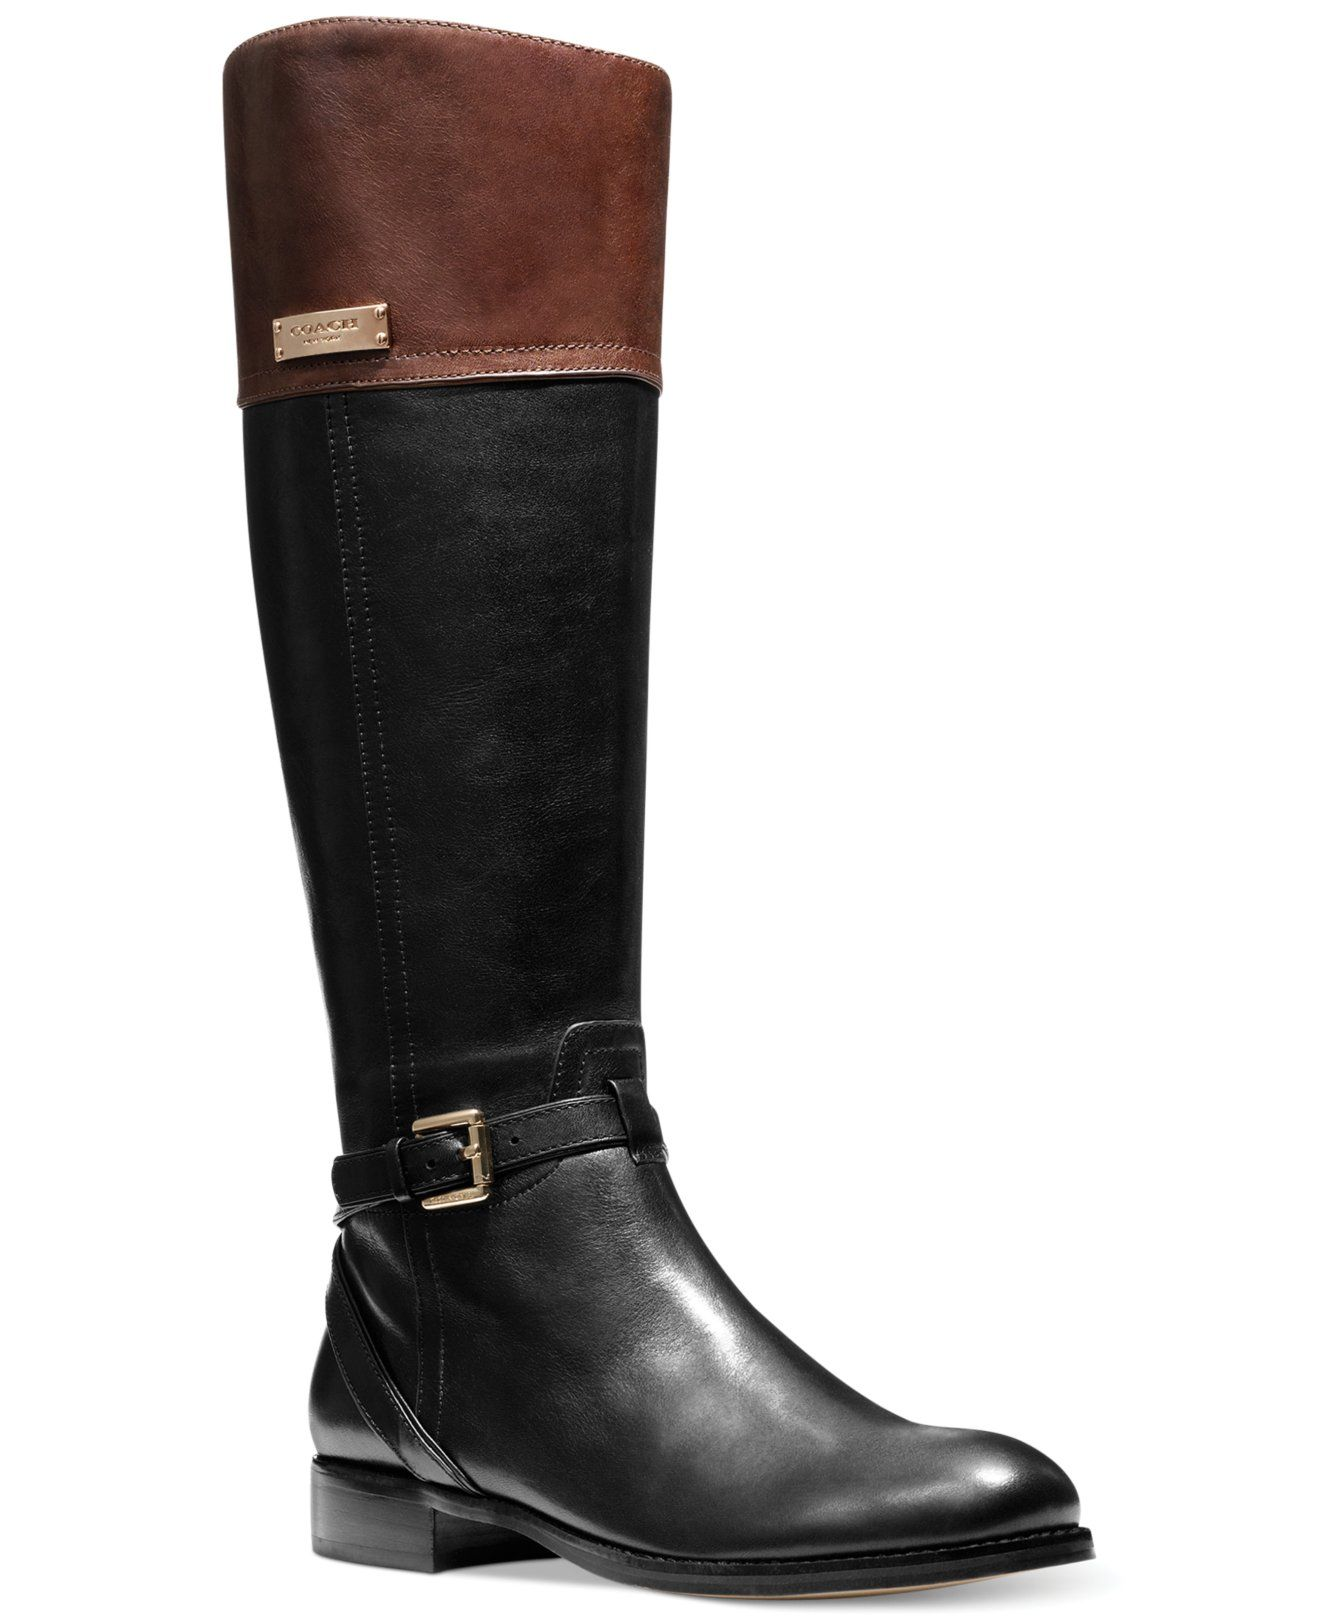 COACH MICHA BOOT - Boots - Shoes - Macy